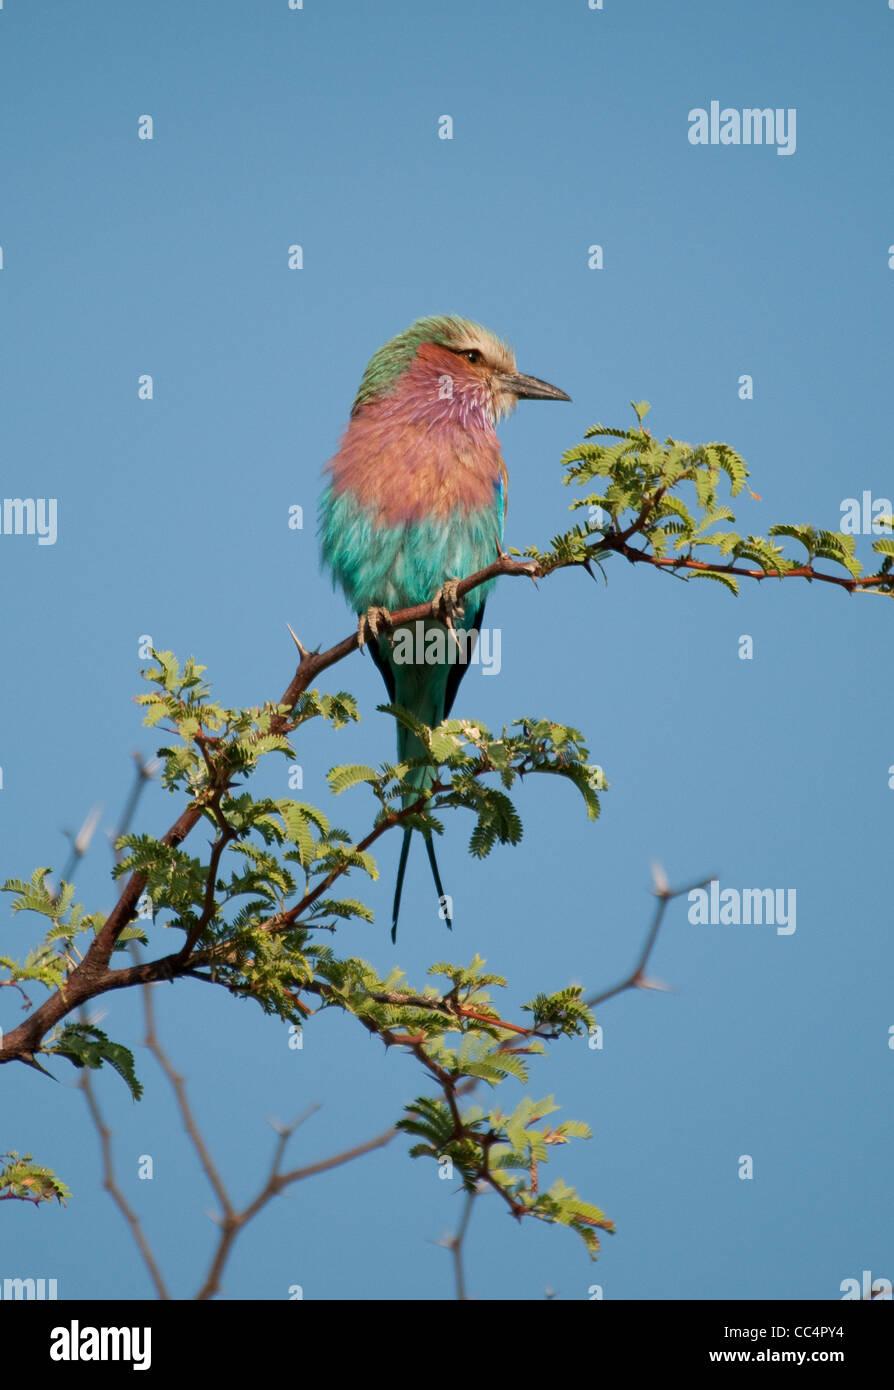 Africa Botswana Tuba Tree. Lilac-breasted Roller perched on limb (Coracias caudatus) Stock Photo